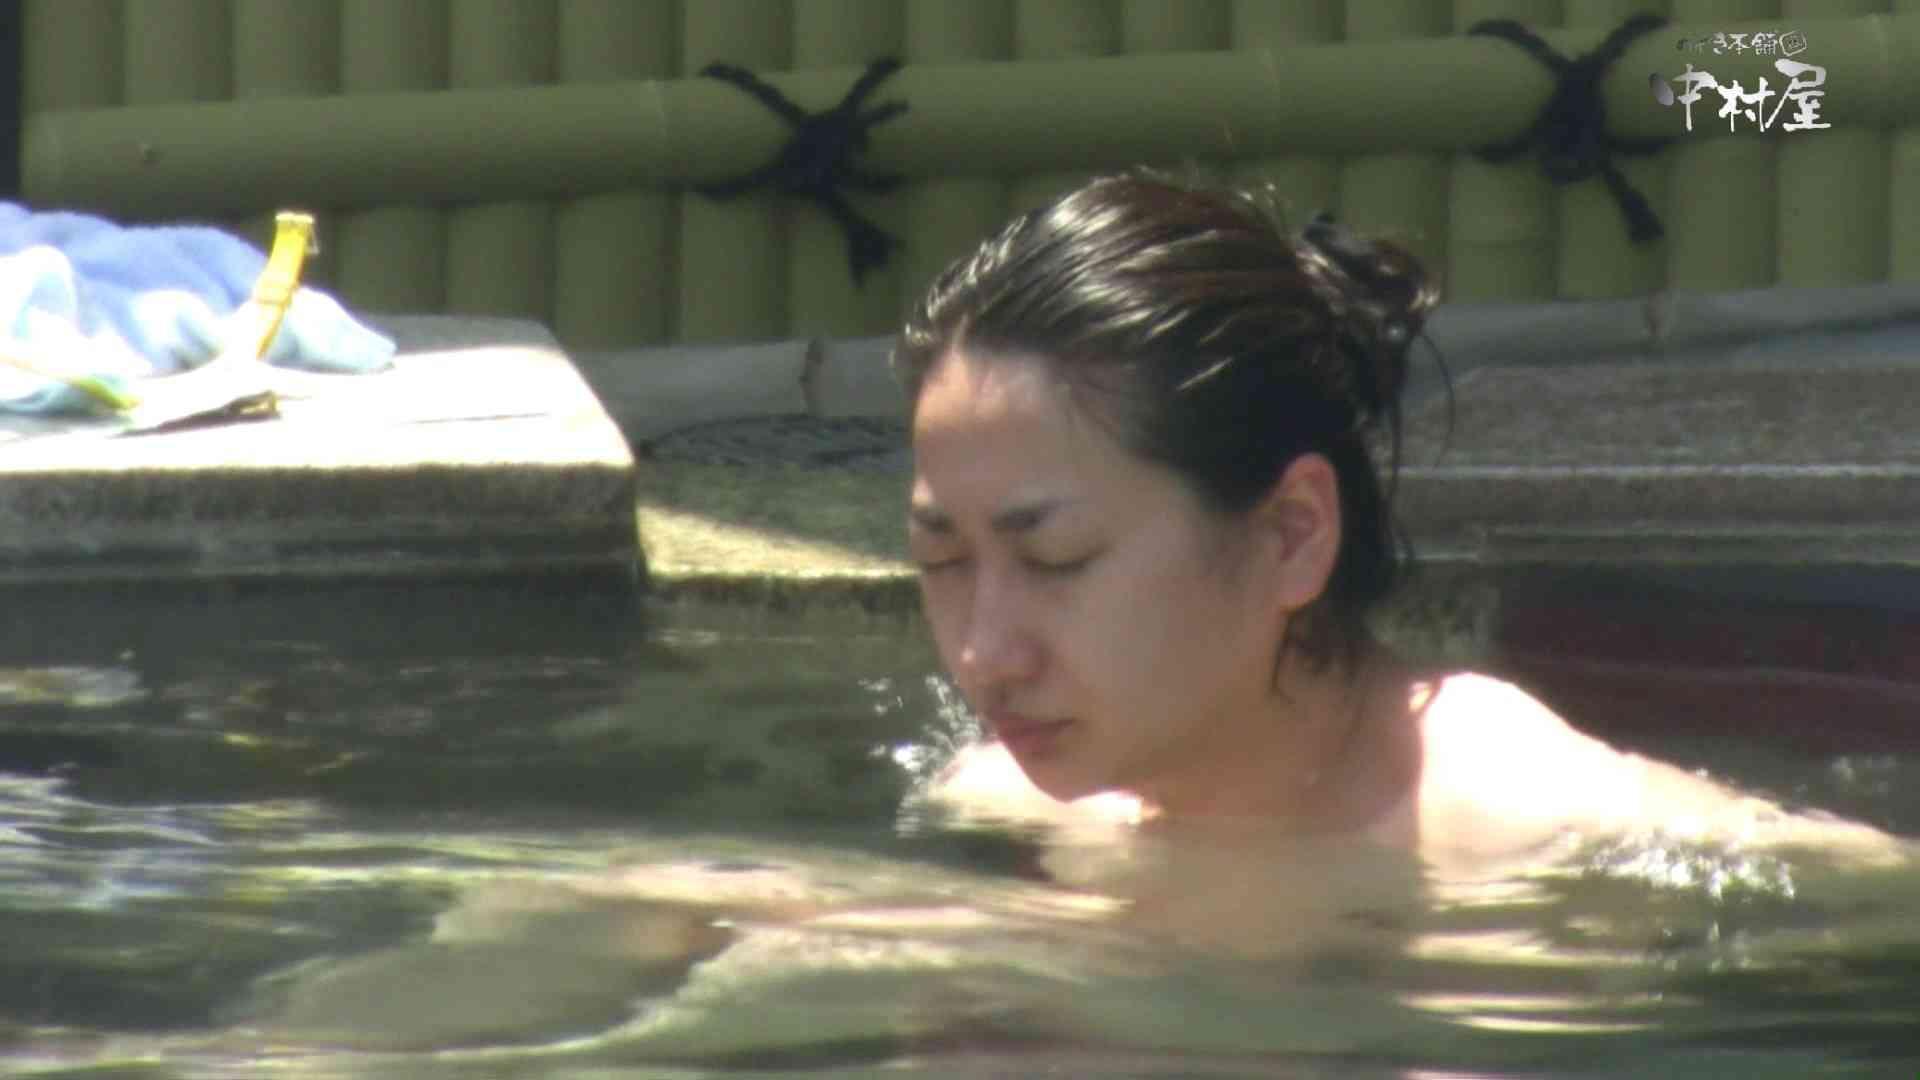 Aquaな露天風呂Vol.888 盗撮 エロ無料画像 77画像 53